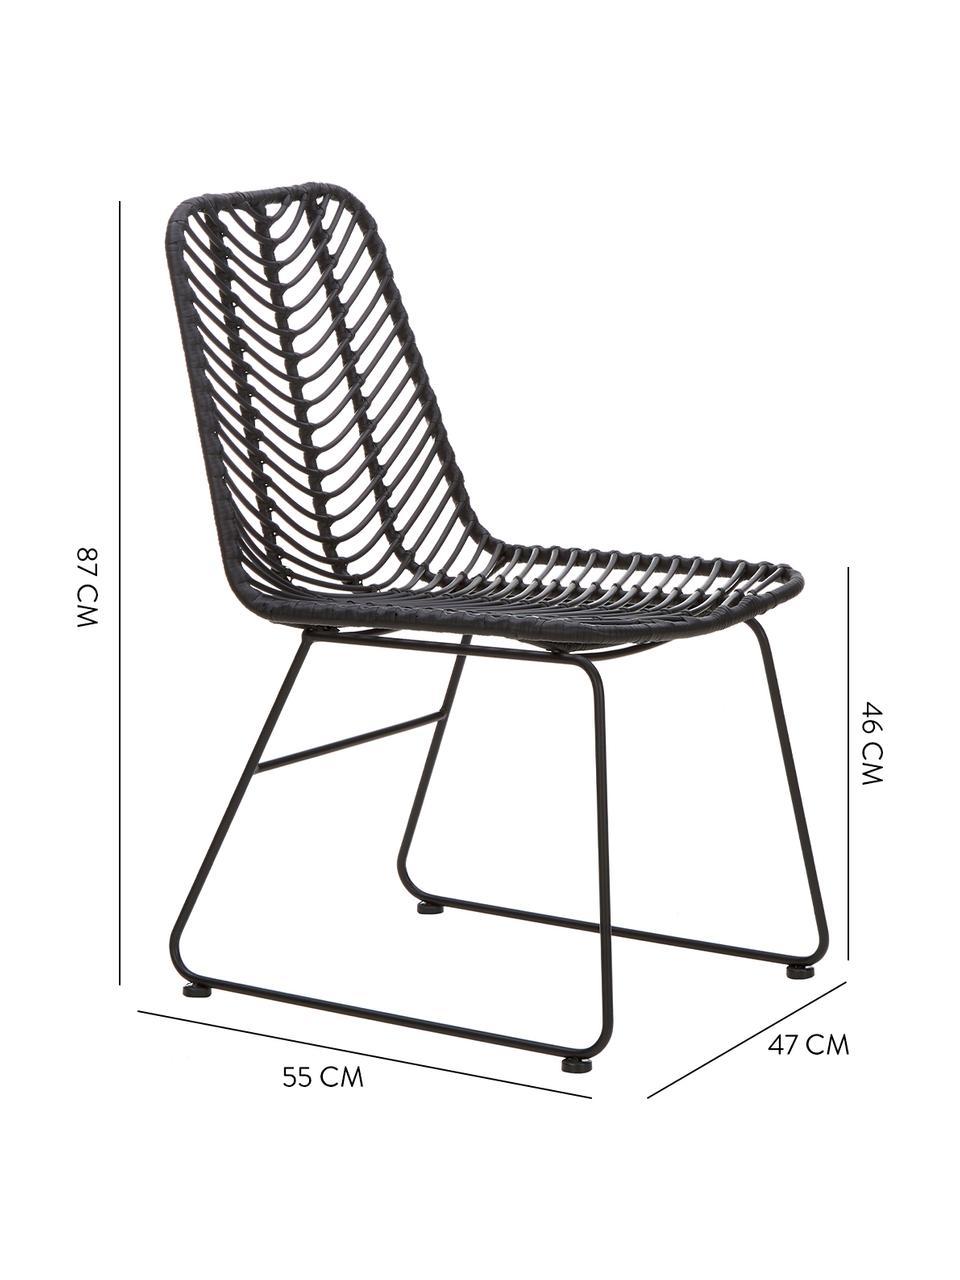 Polyrattan-Stuhl Providencia, Sitzfläche: Polyethylen-Geflecht, Gestell: Metall, pulverbeschichtet, Schwarz, B 47 x T 63 cm